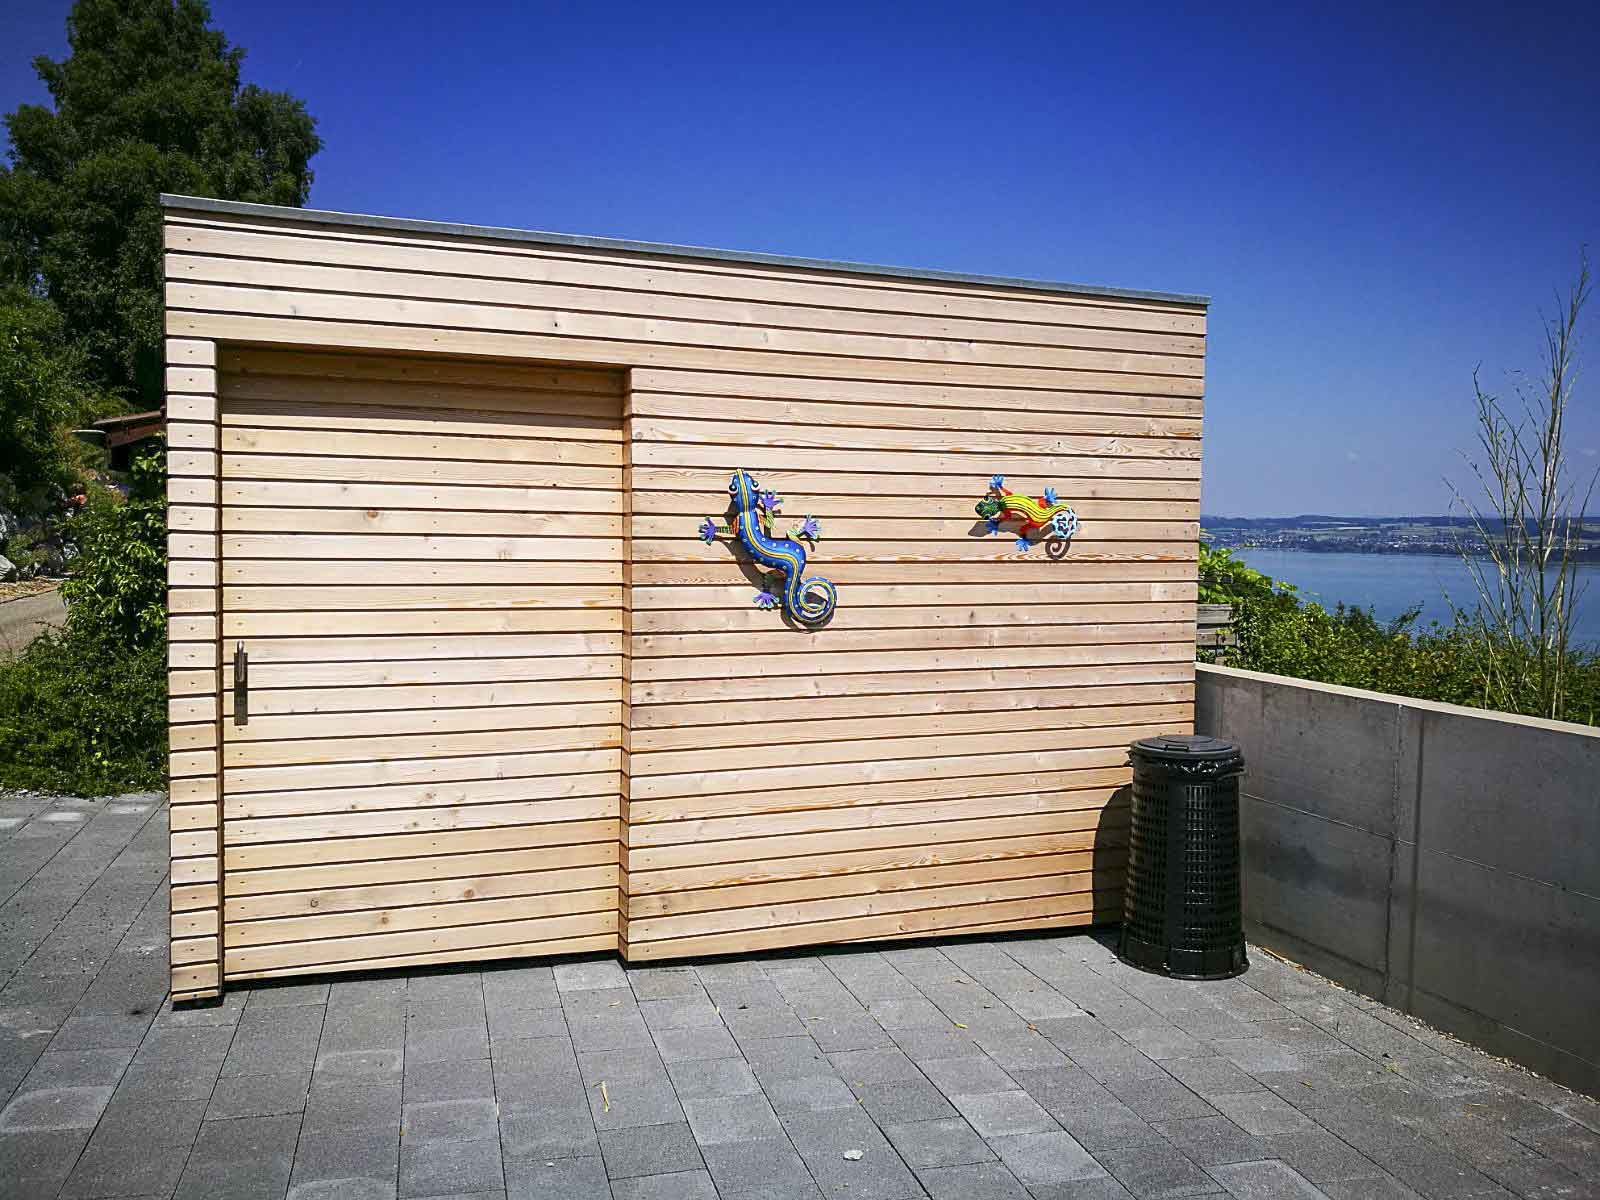 Wooddesign_Terrassengestaltung_Veounterstand_Carport_Lärchenholz vergraut_Holzverschalung_Schiebetüre-Flachdach (1)